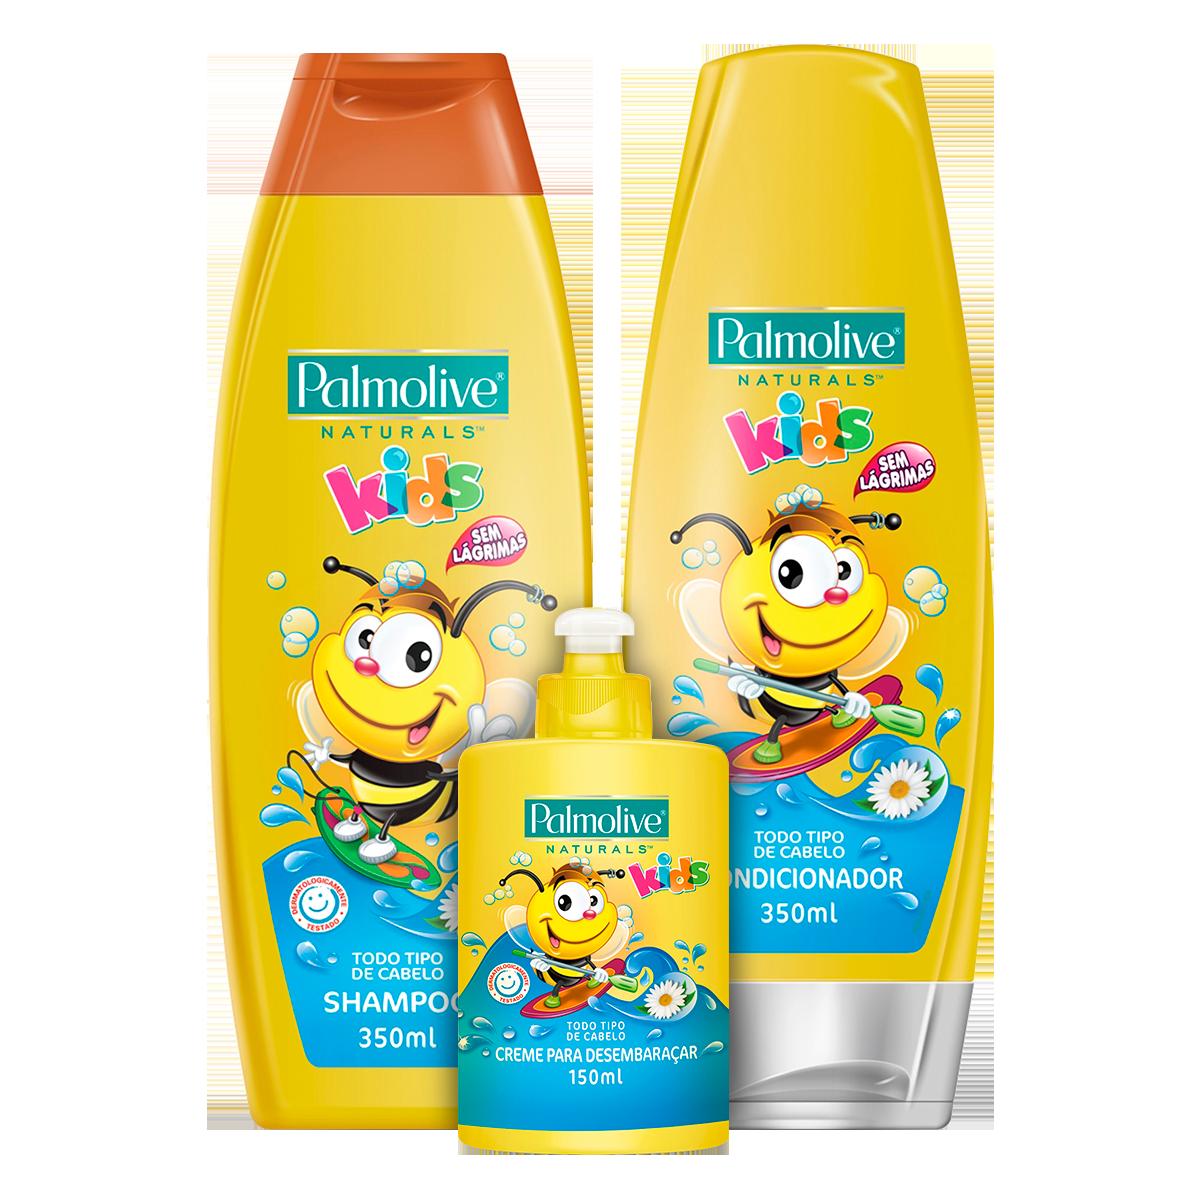 bdd177c73 Kit com Shampoo, Condicionador e Creme de Pentear Infantil PALMOLIVE  Naturals Kids Todos Tipos de Cabelos